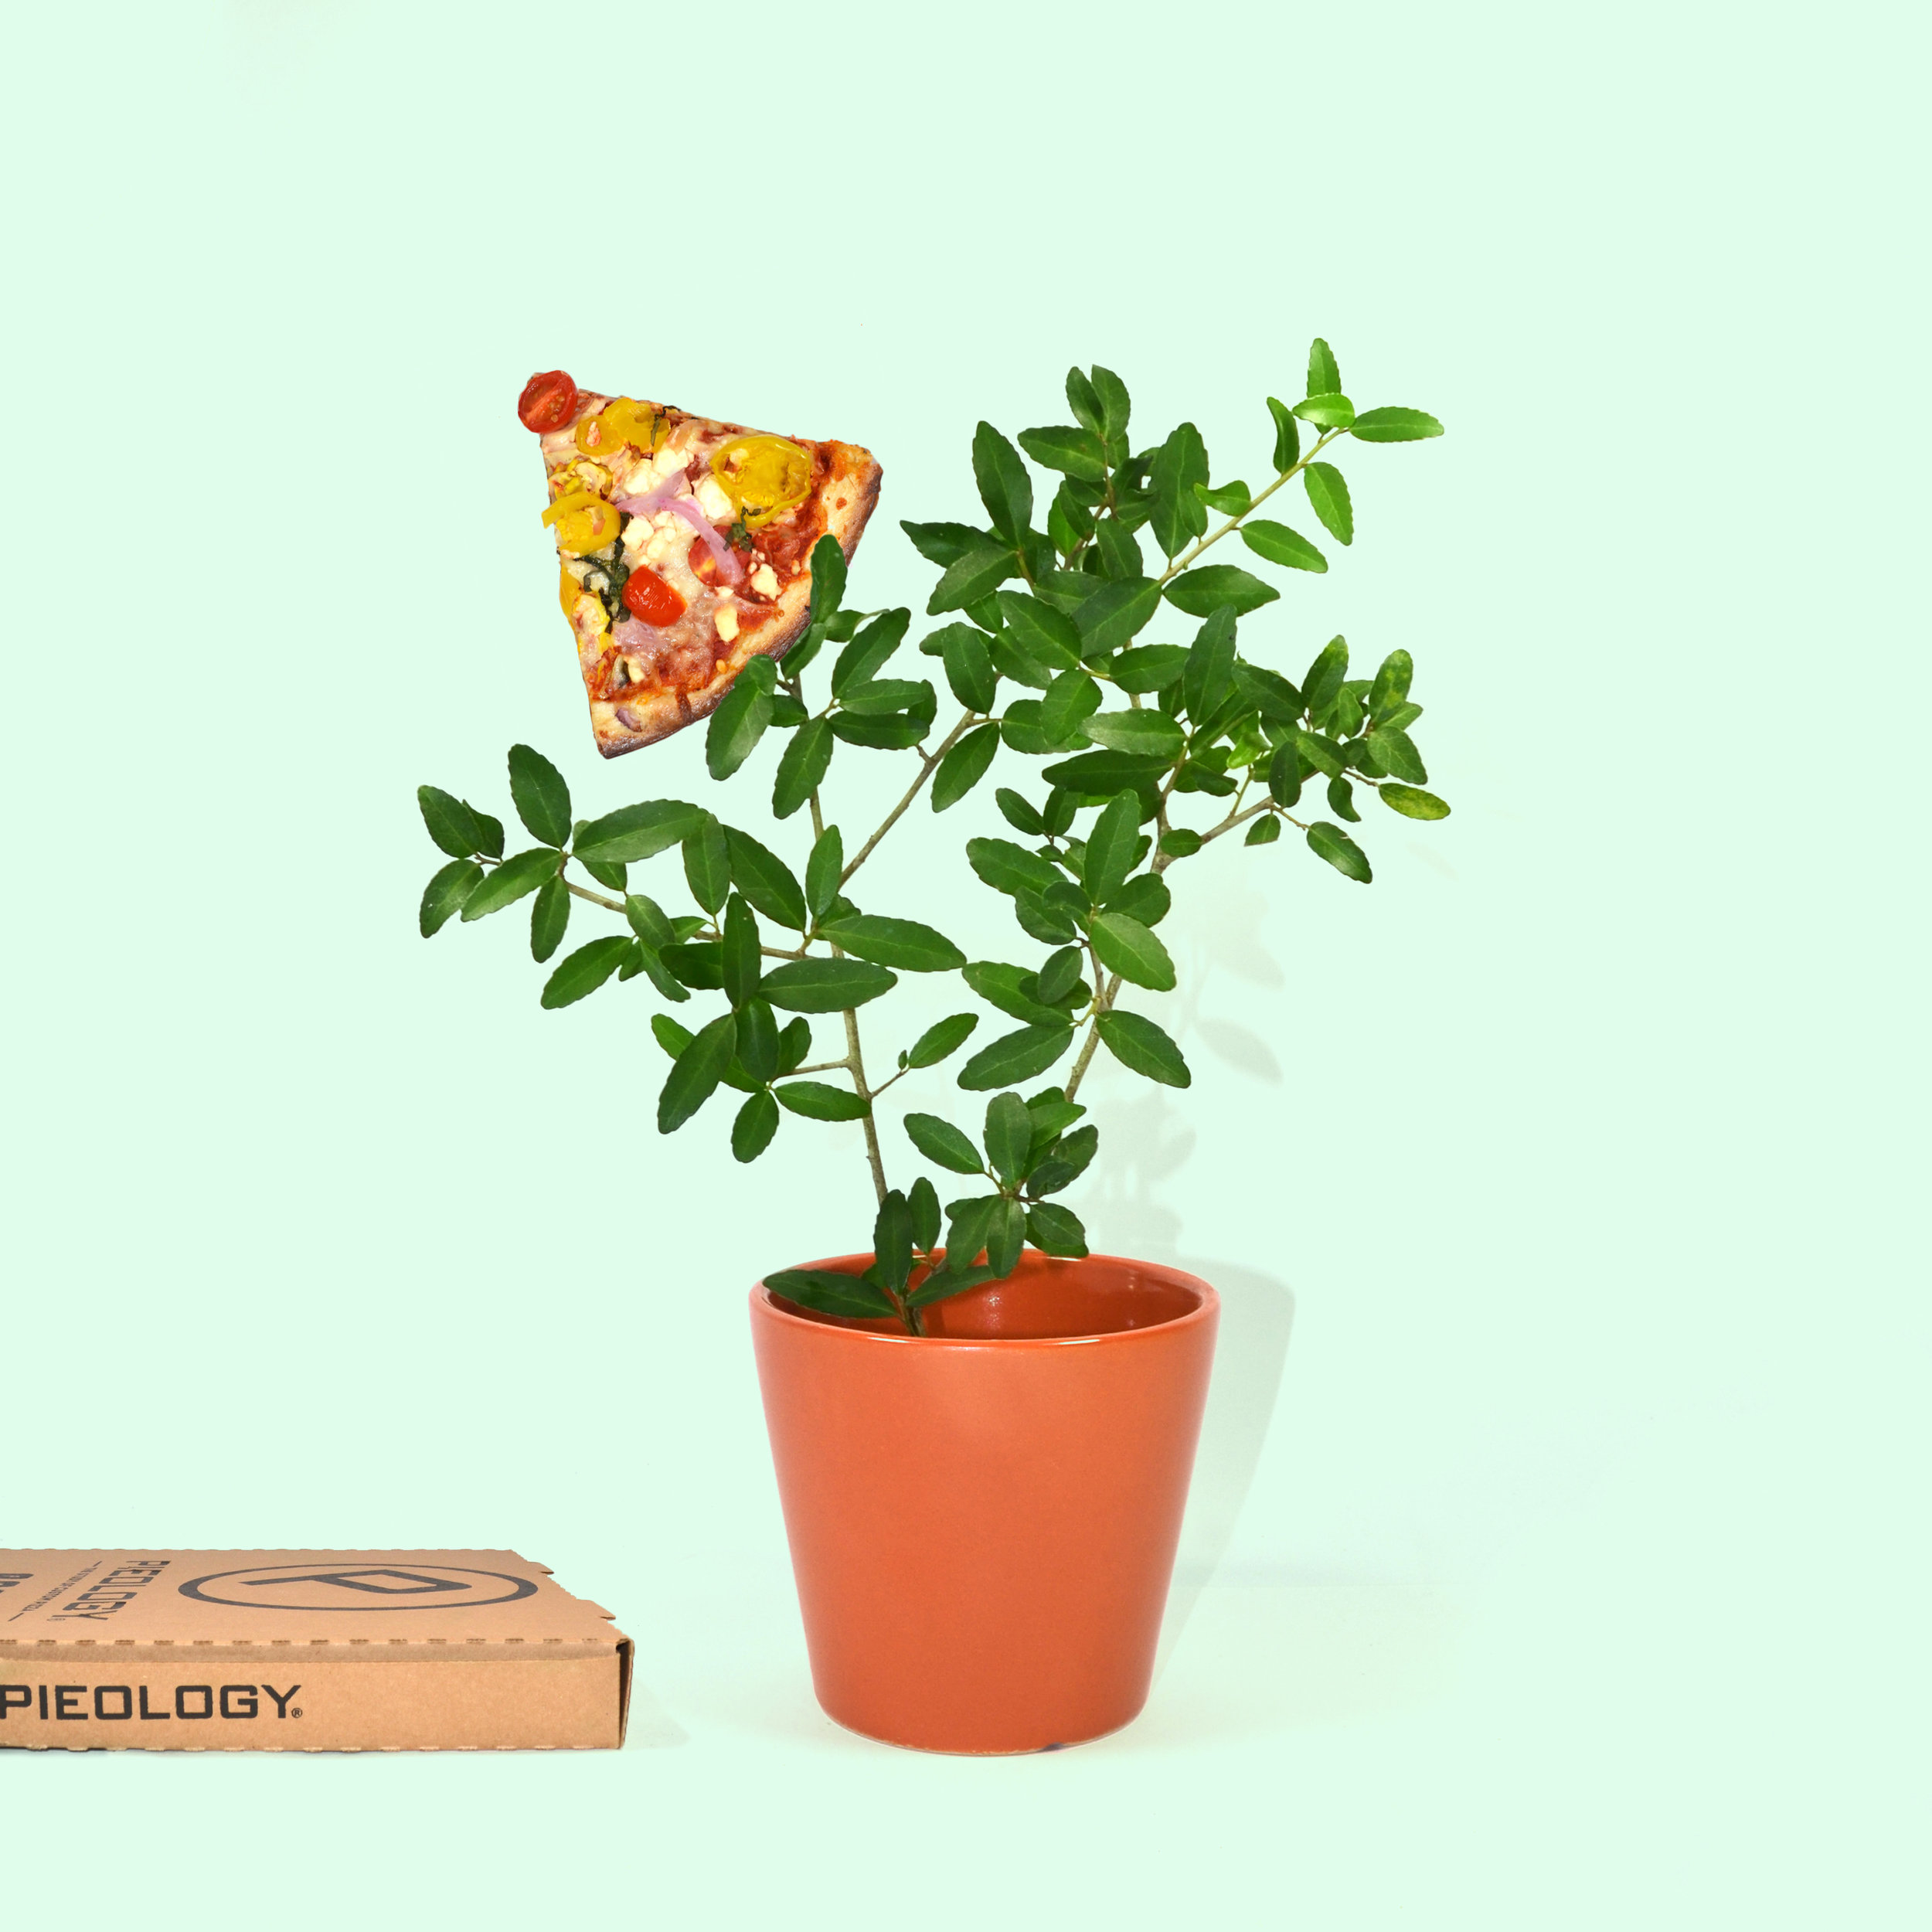 pieology-if-pizza-grew-on-trees-2.jpg